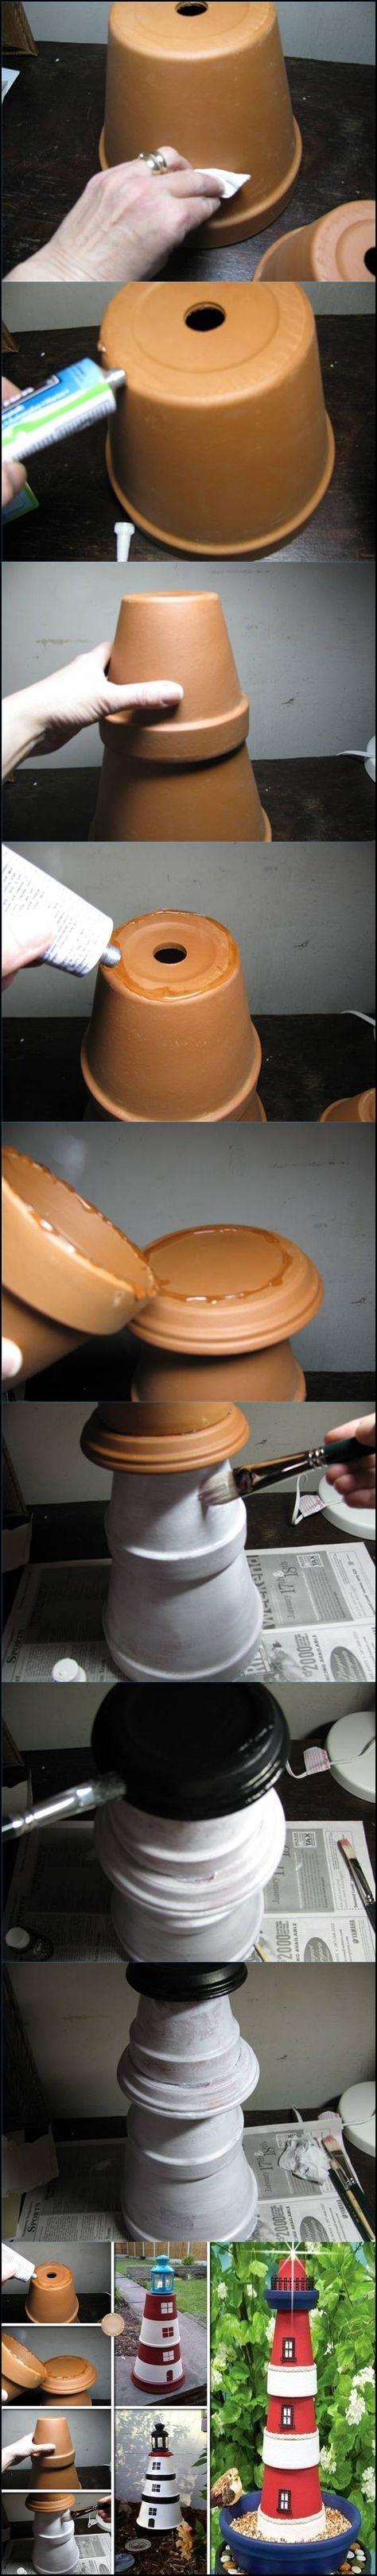 #DIY clay pot lighthouse --> http://wonderfuldiy.com/wonderful-diy-clay-pot-lighthouse/ #lighthouse